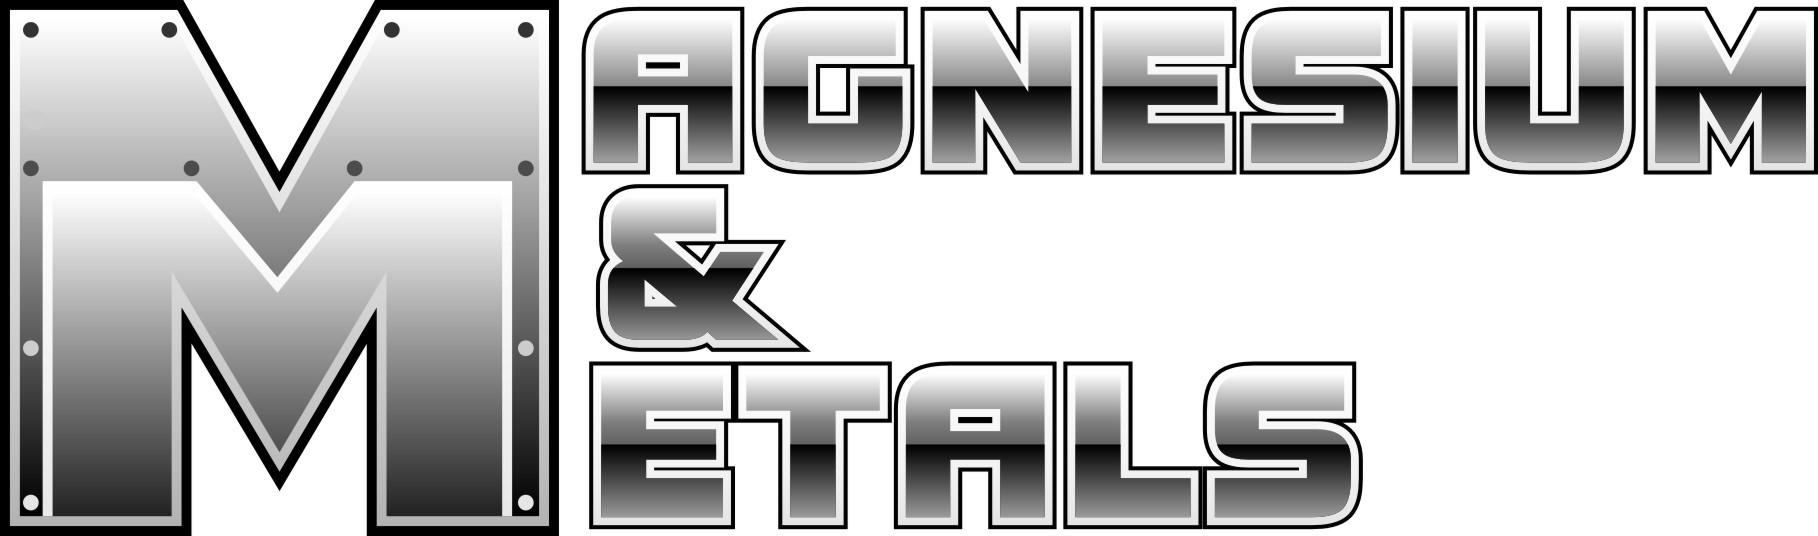 Логотип для проекта Magnesium&Metals фото f_4e7b1a4af2d4a.jpg